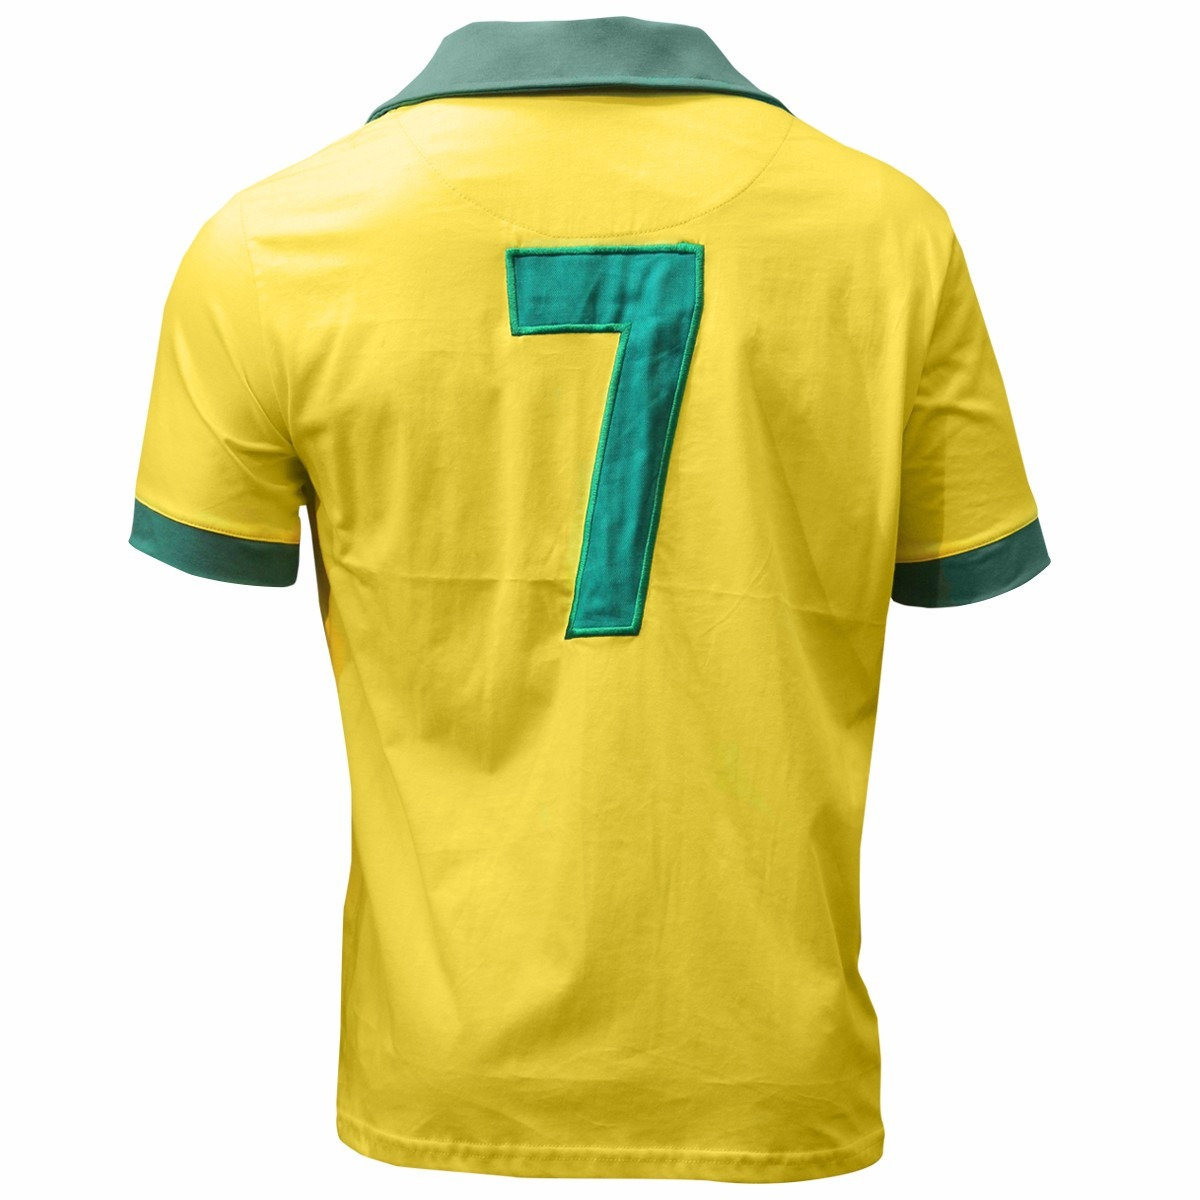 fc3548ce3 camisa retro brasil 1962 amarela. Carregando zoom.